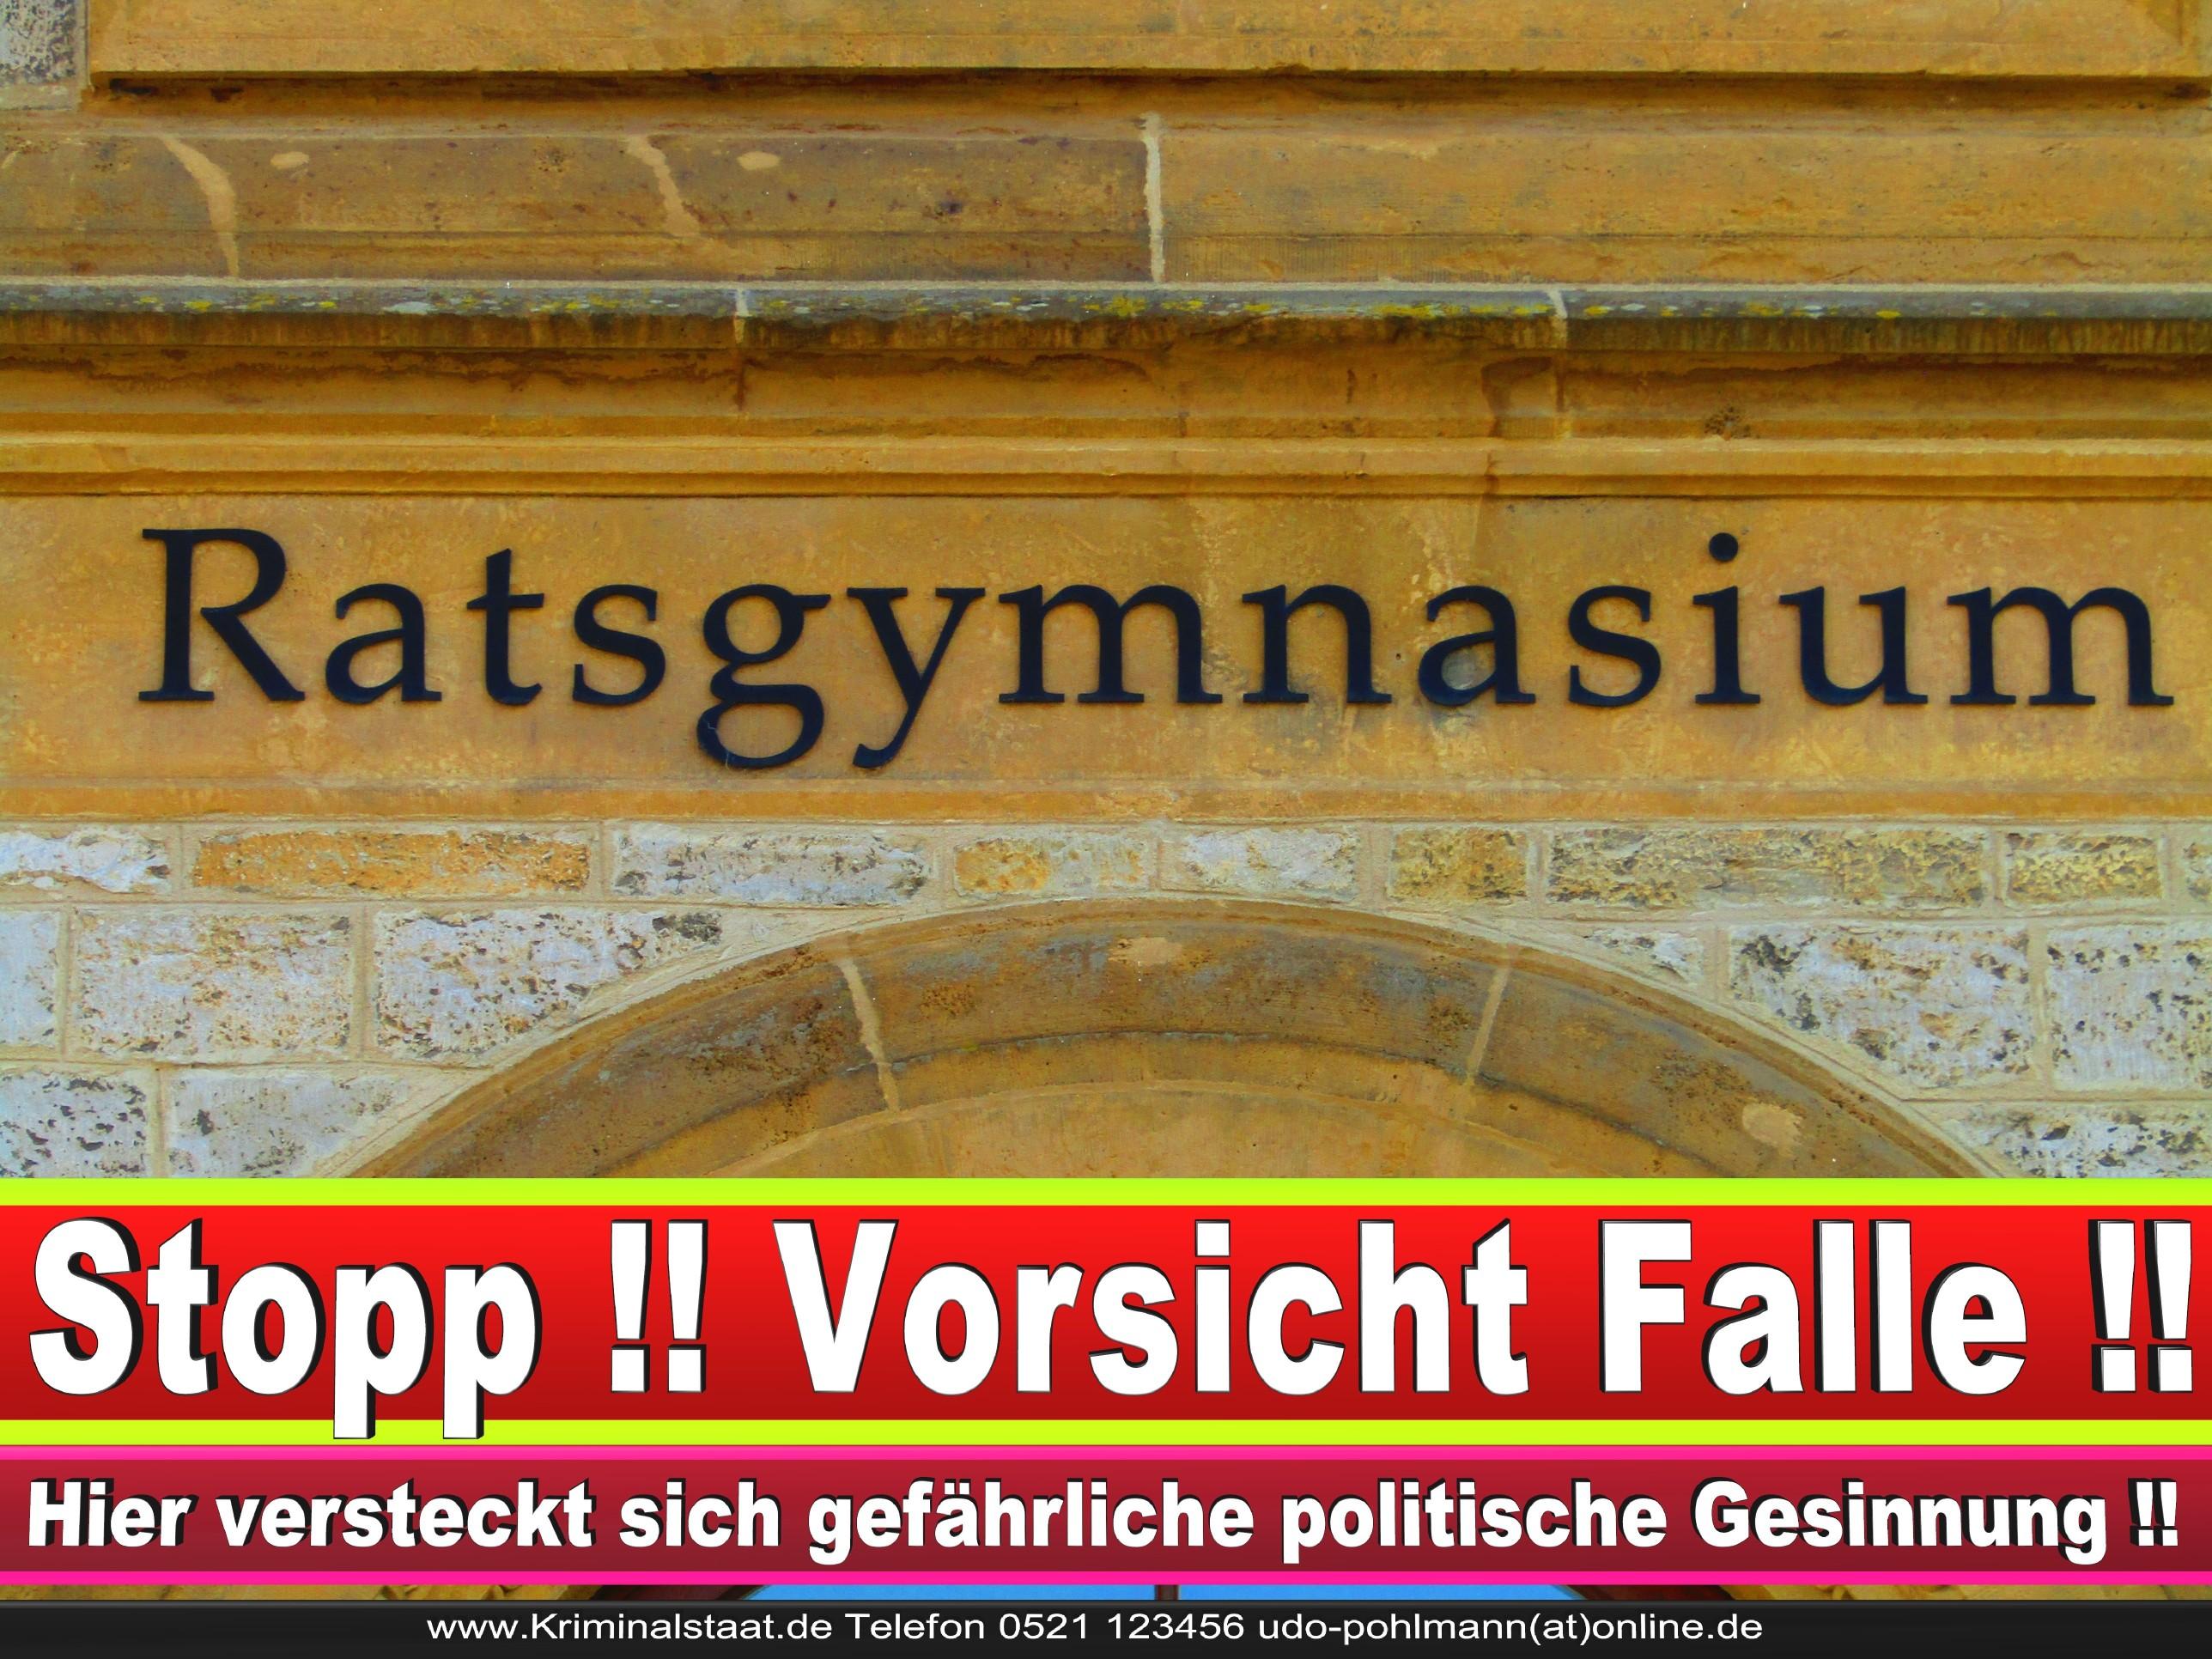 RATSGYMNASIUM BIELEFELD NORMAN GRAESER CDU BIELEFELD 1 LANDTAGSWAHL BUNDESTAGSWAHL BÜRGERMEISTERWAHL